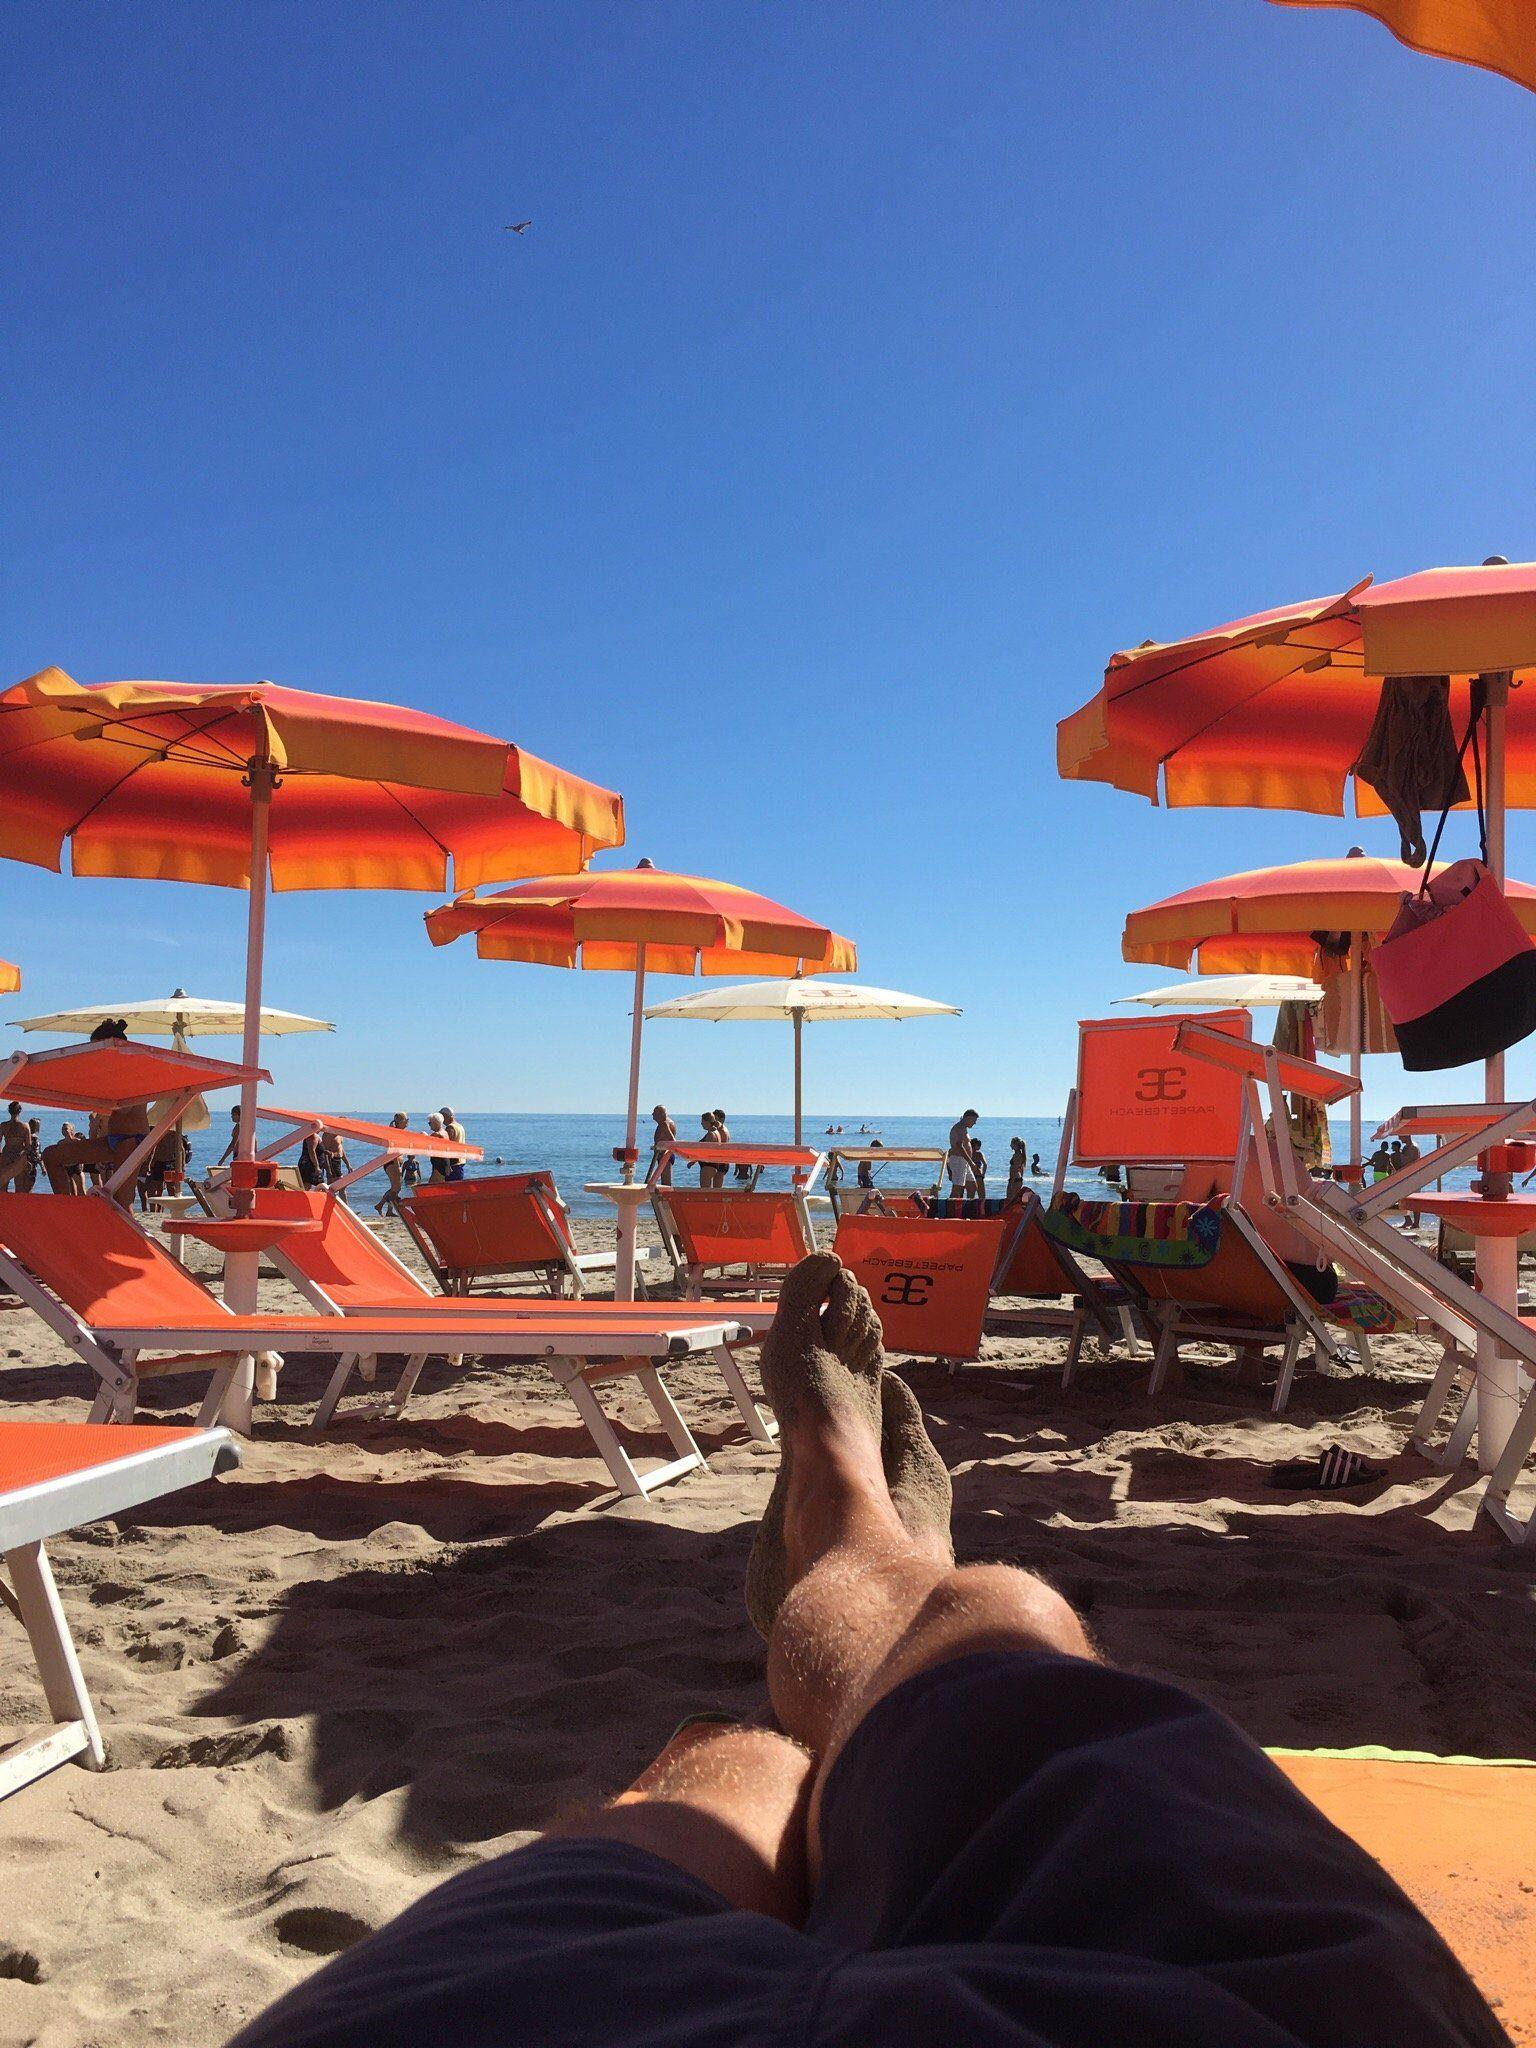 Papeete Beach - Cervia Milano Marittima, Italy | Ravenna | Pinterest ...